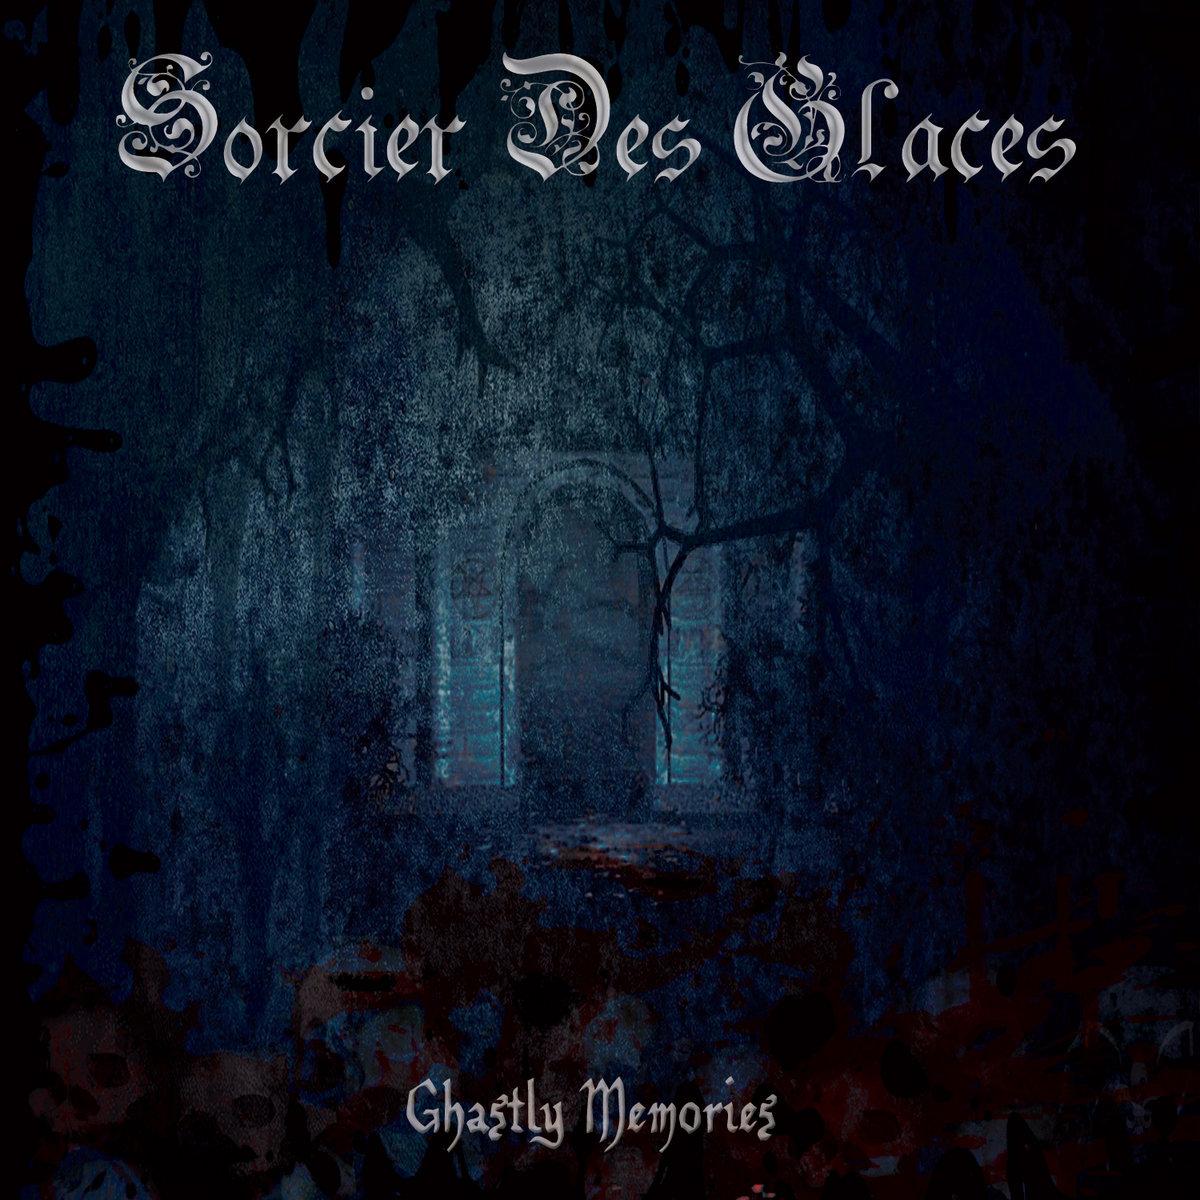 Ghastly Memories EP Sorcier des Glaces Cover Artwork